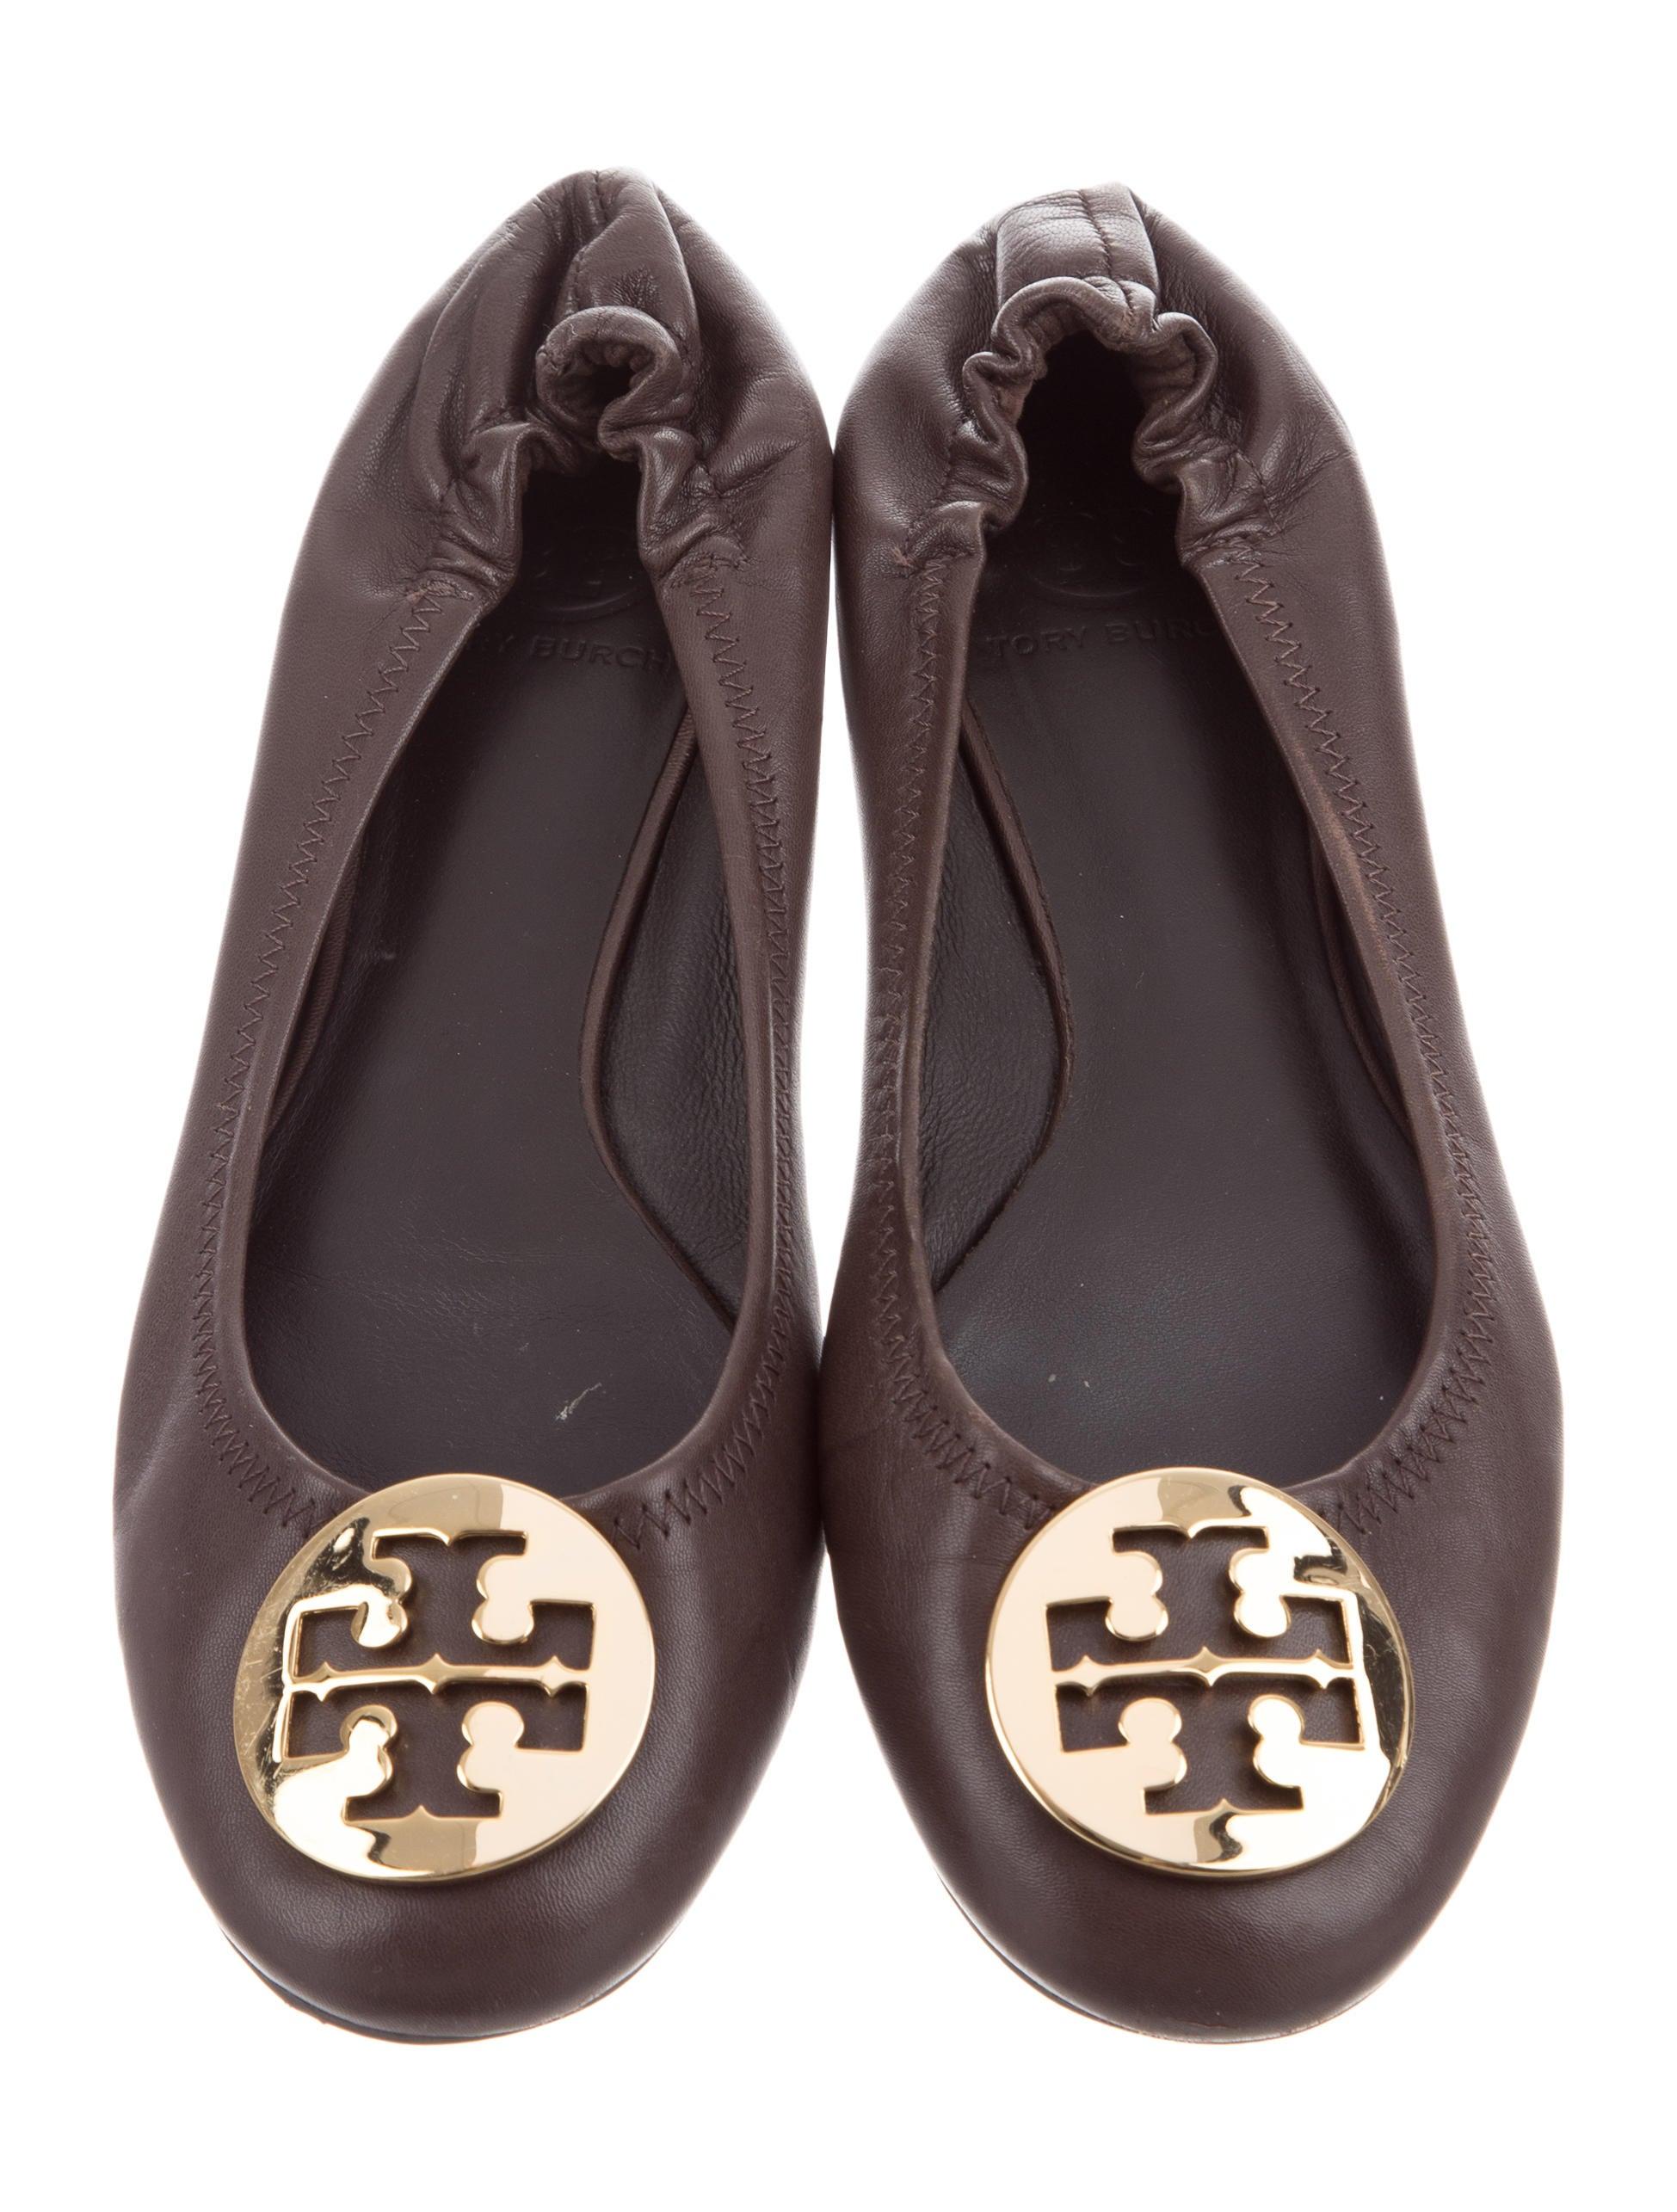 Leather Reva Flats